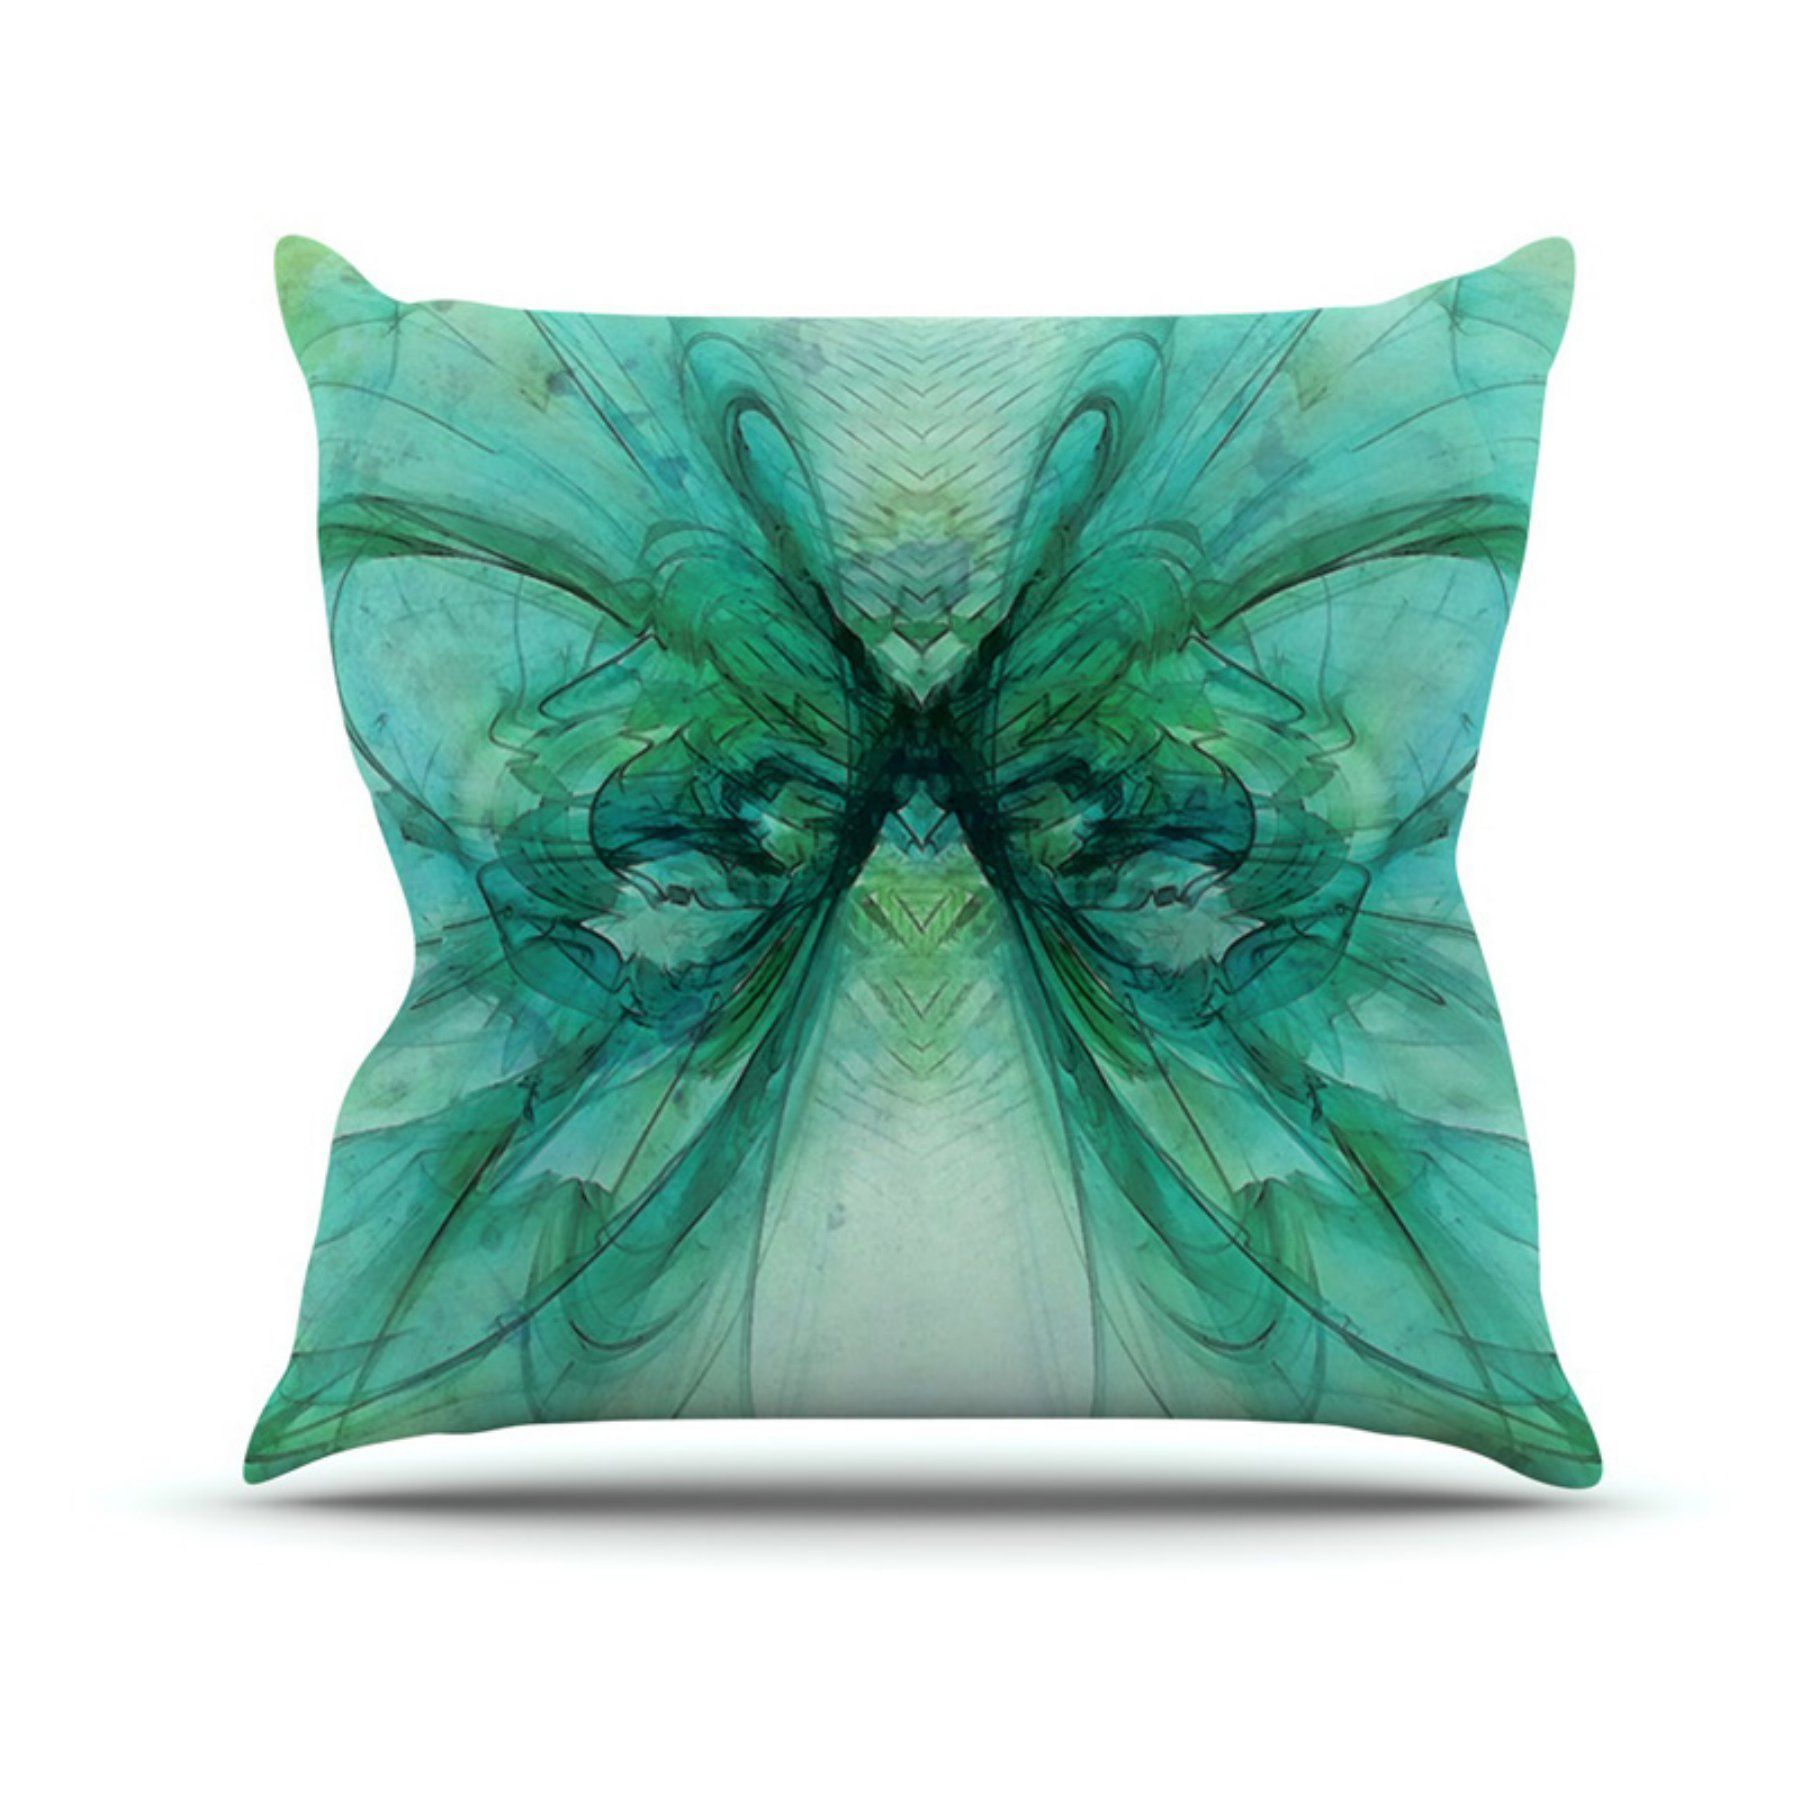 Kess inhouse alison coxon butterfly indooroutdoor throw pillow